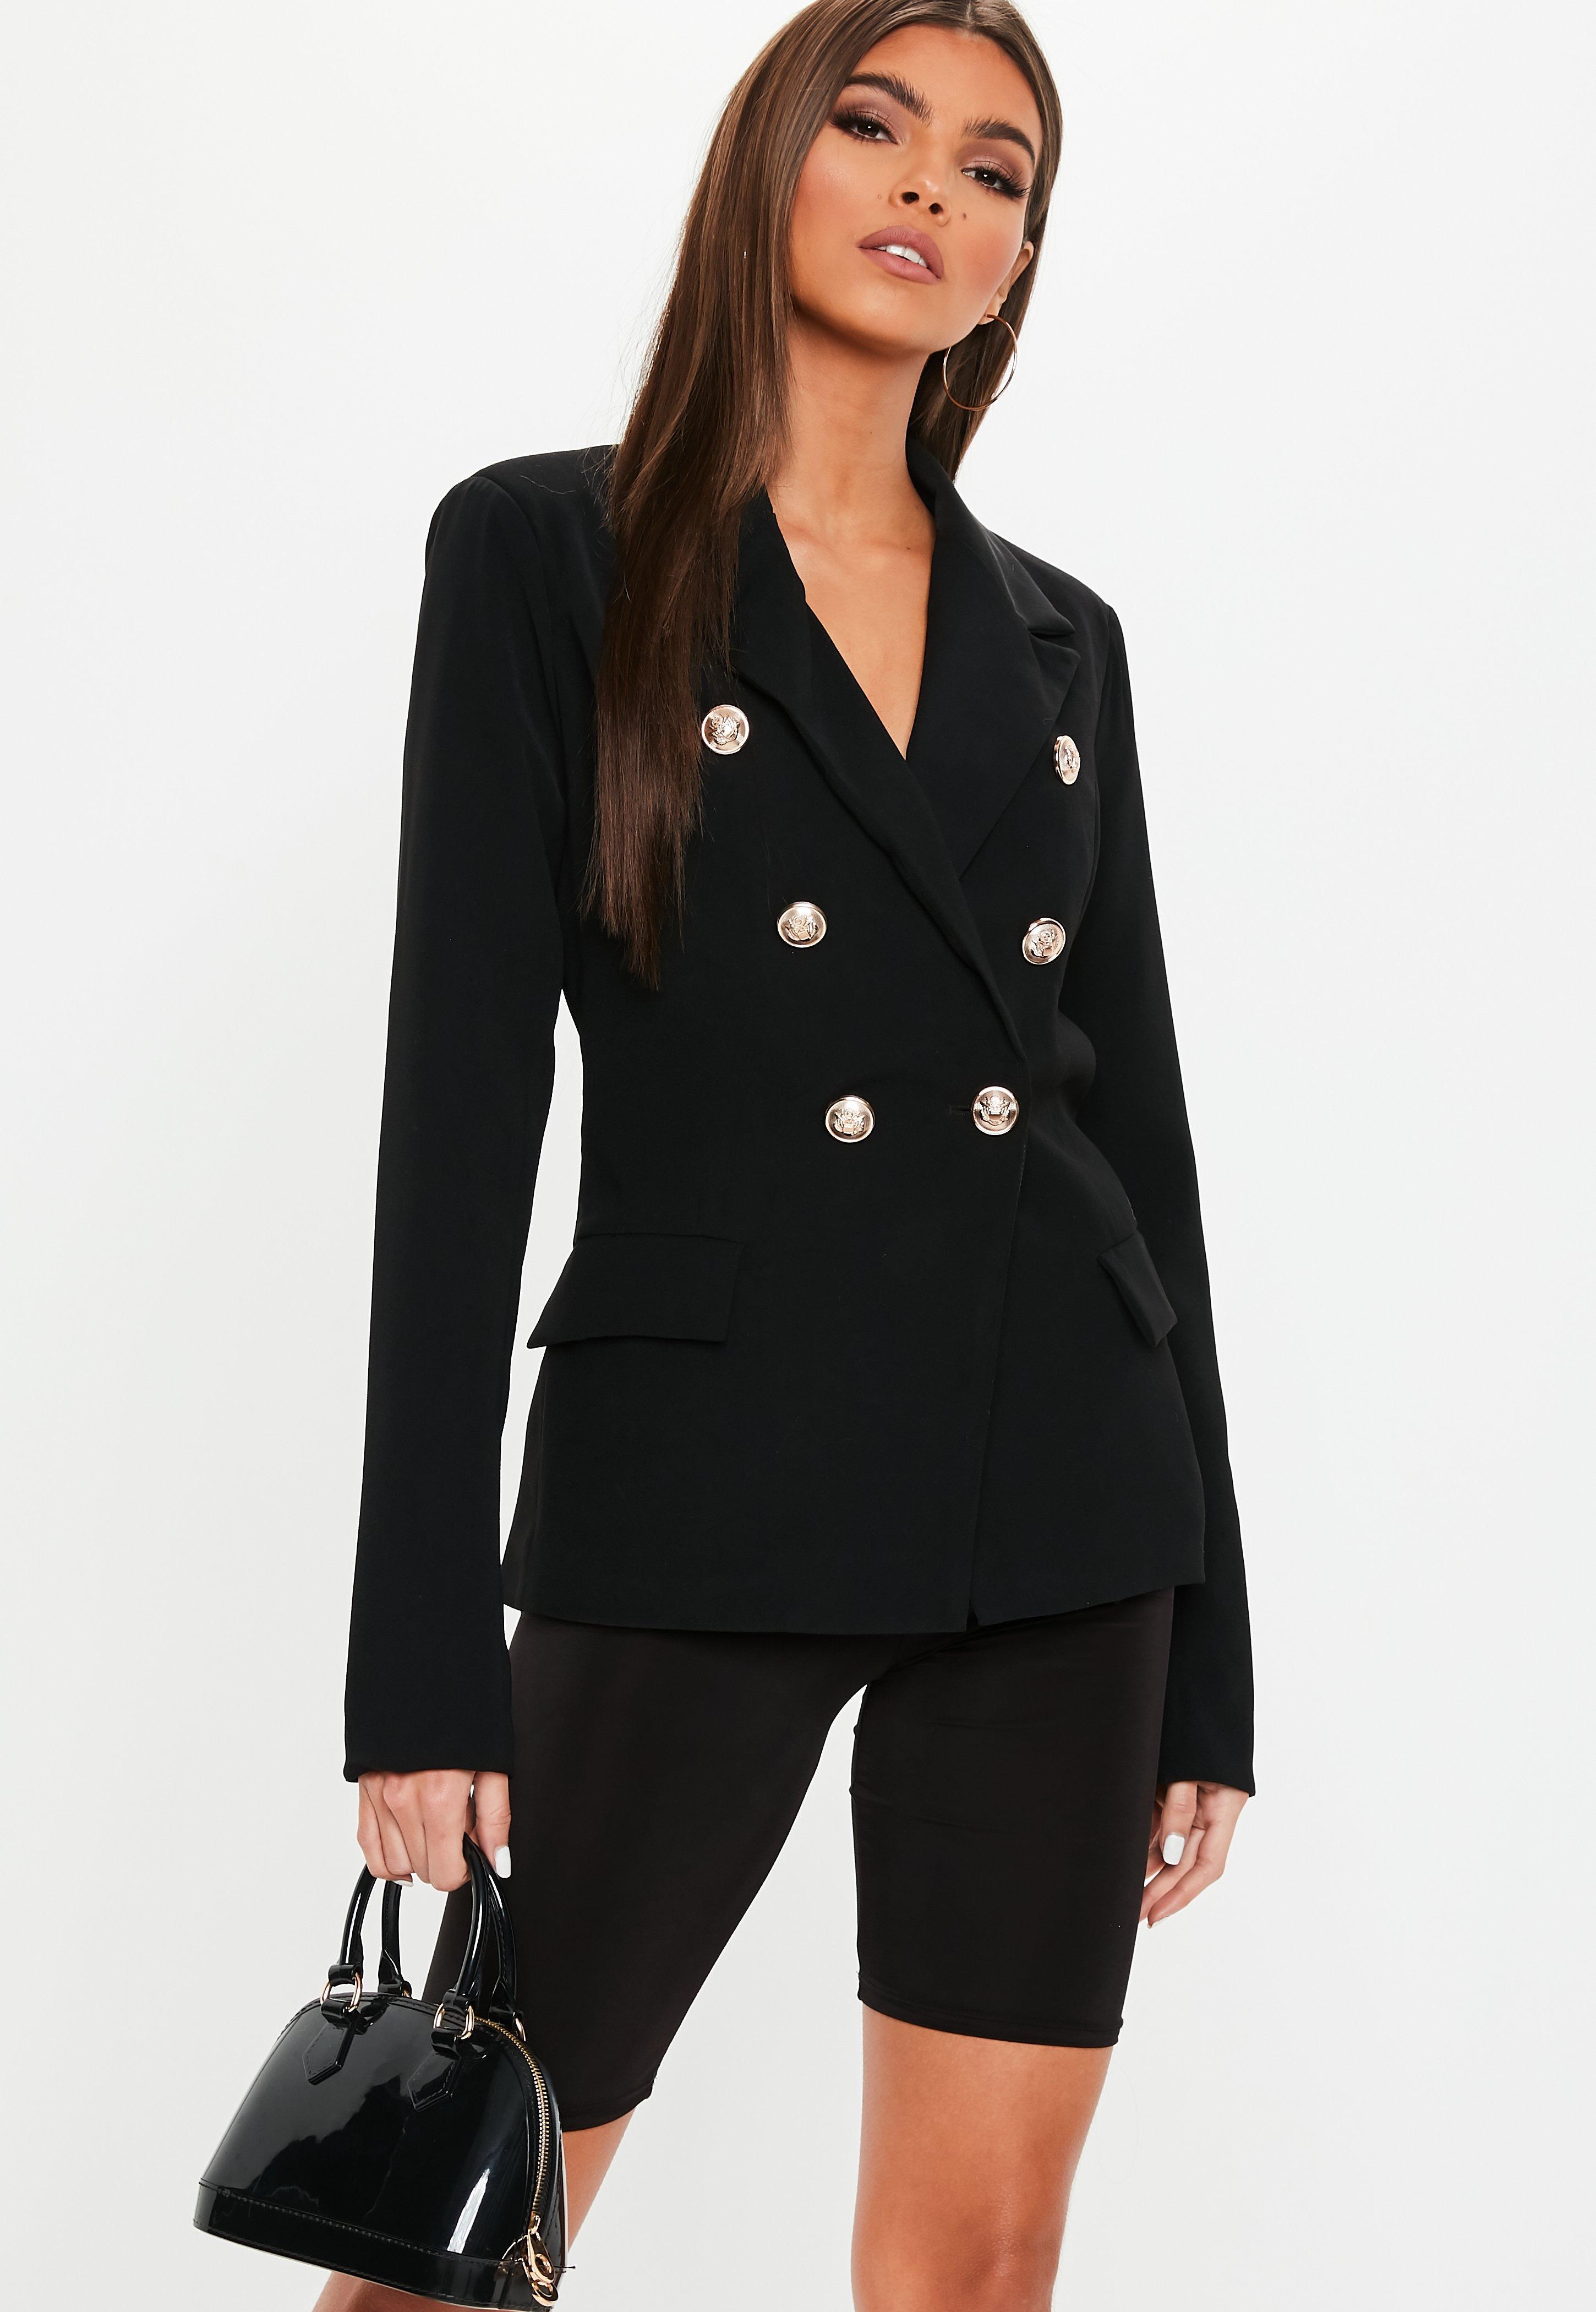 Blazers for Women - Shop Smart   Tweed Blazers UK - Missguided c3e01ccc2